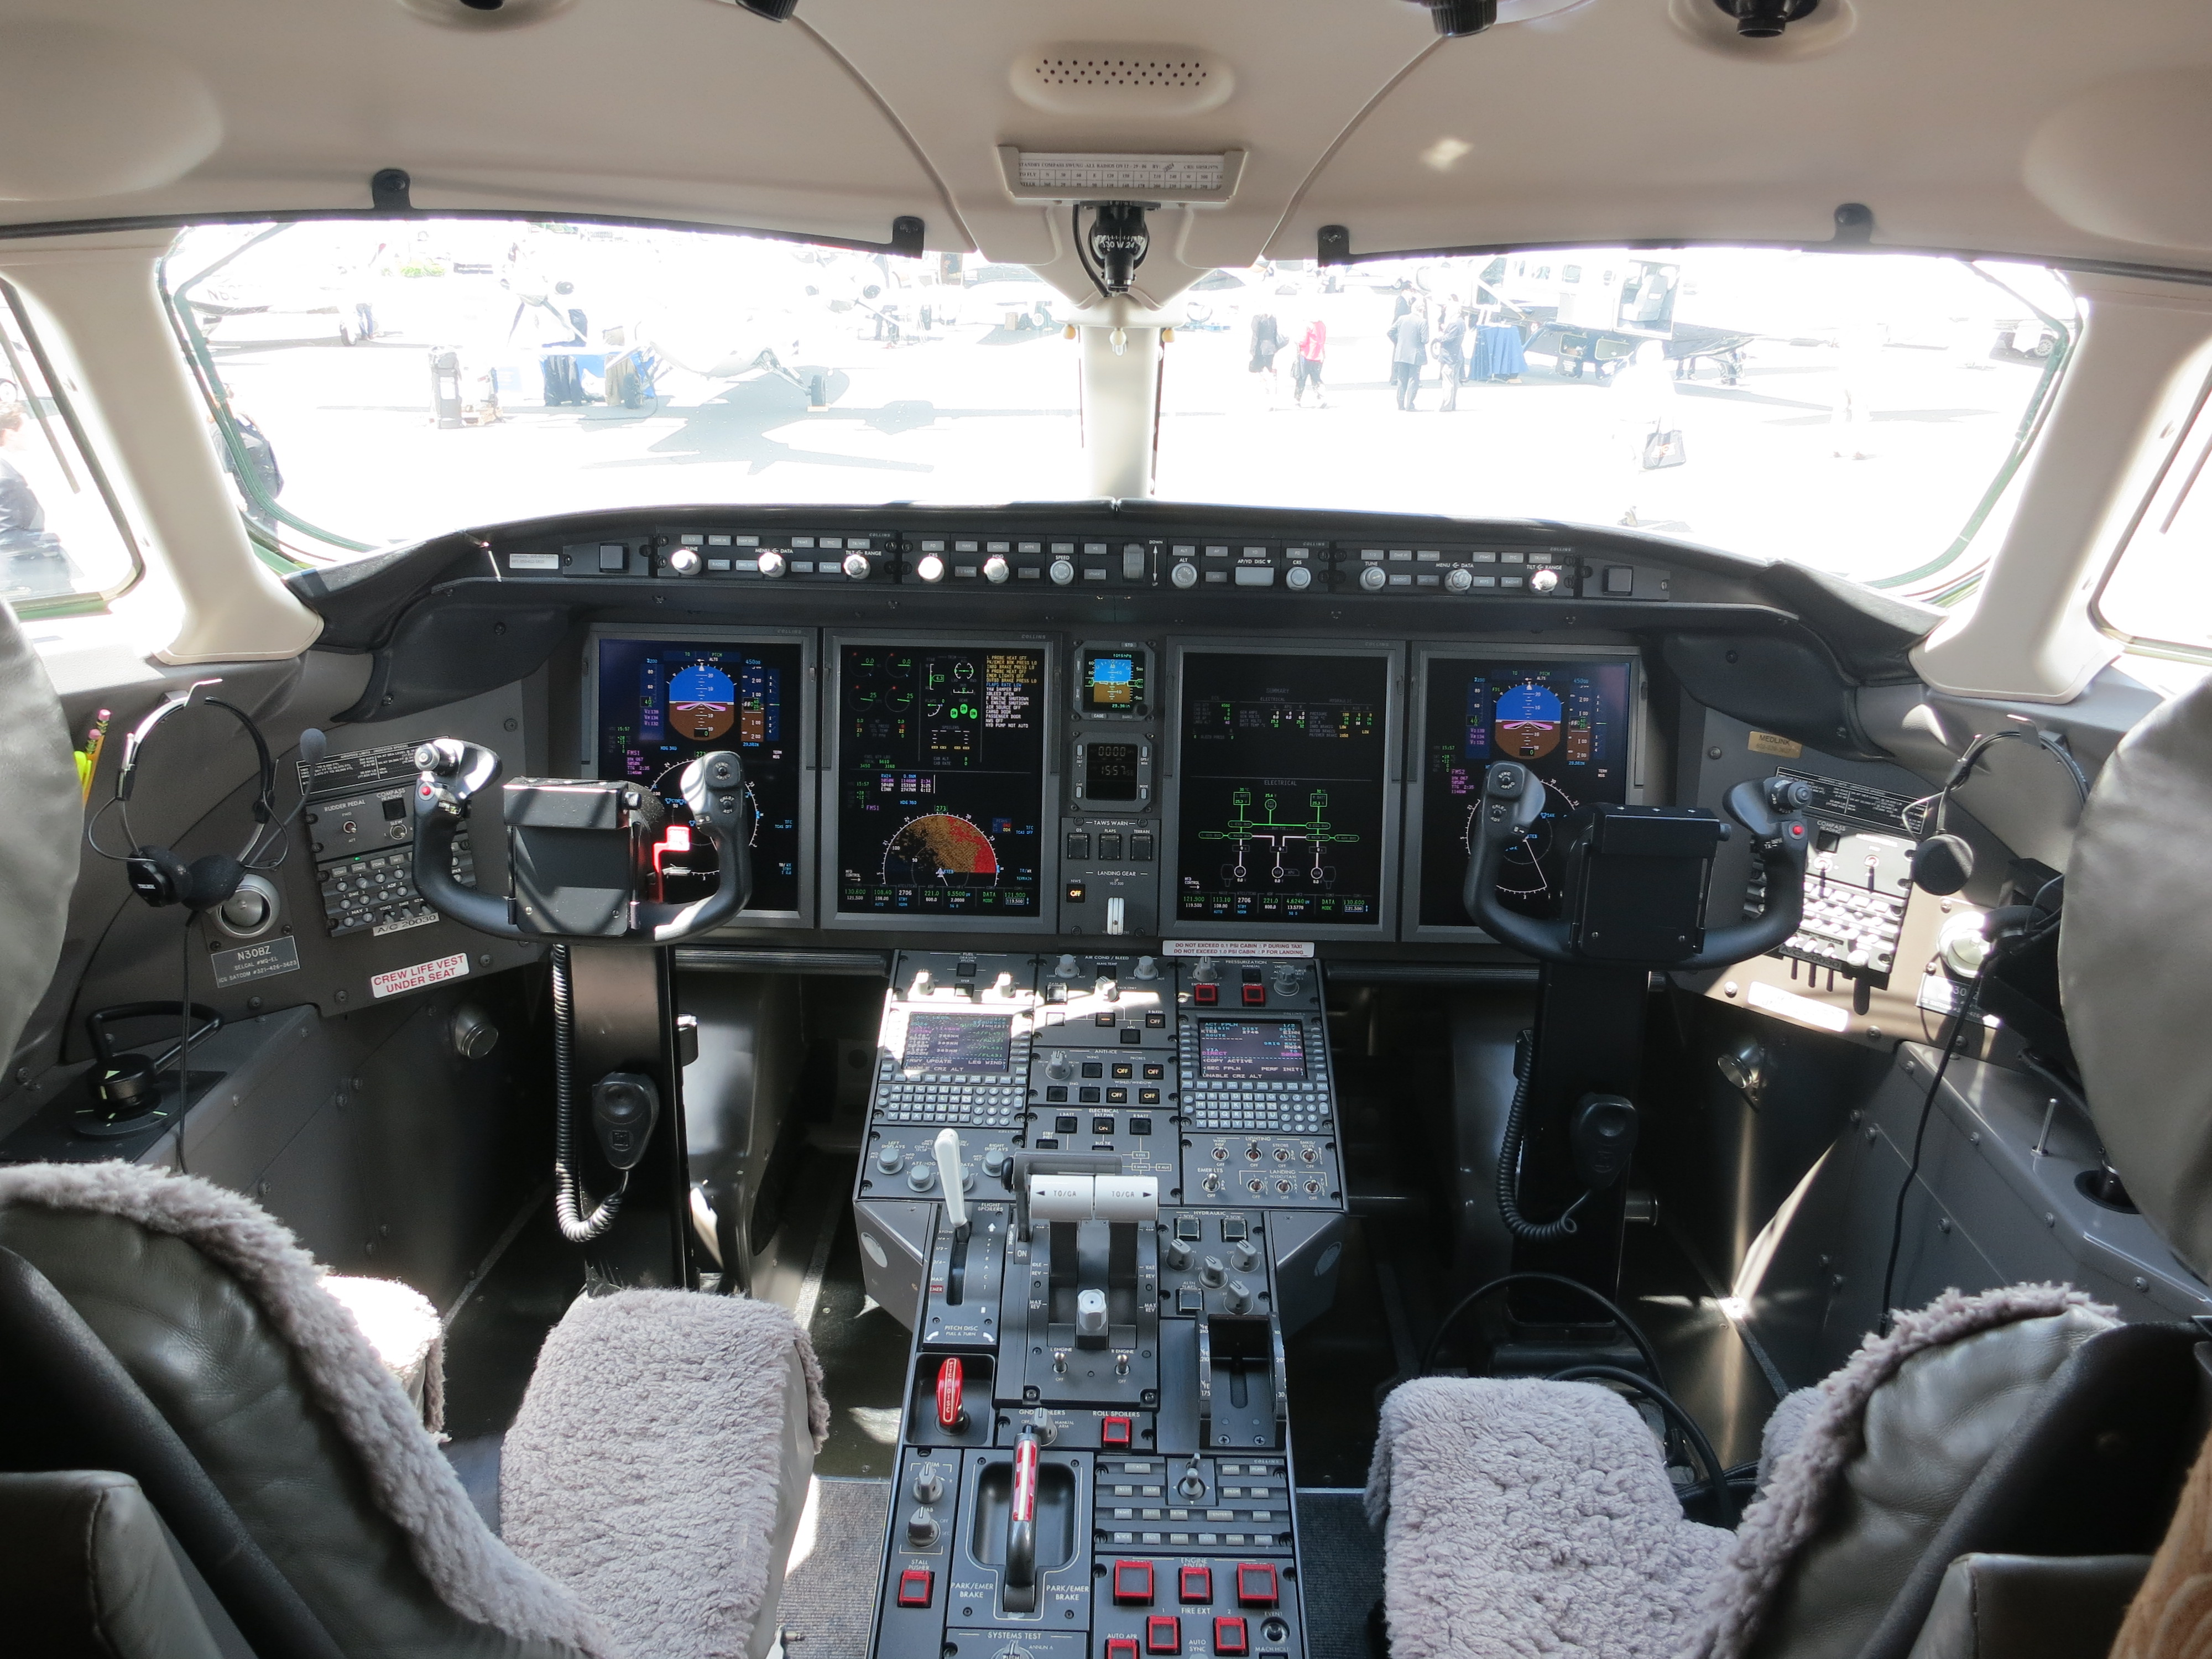 fdeb0f21838c8 File Bombardier Challenger 300 cockpit.JPG - Wikimedia Commons